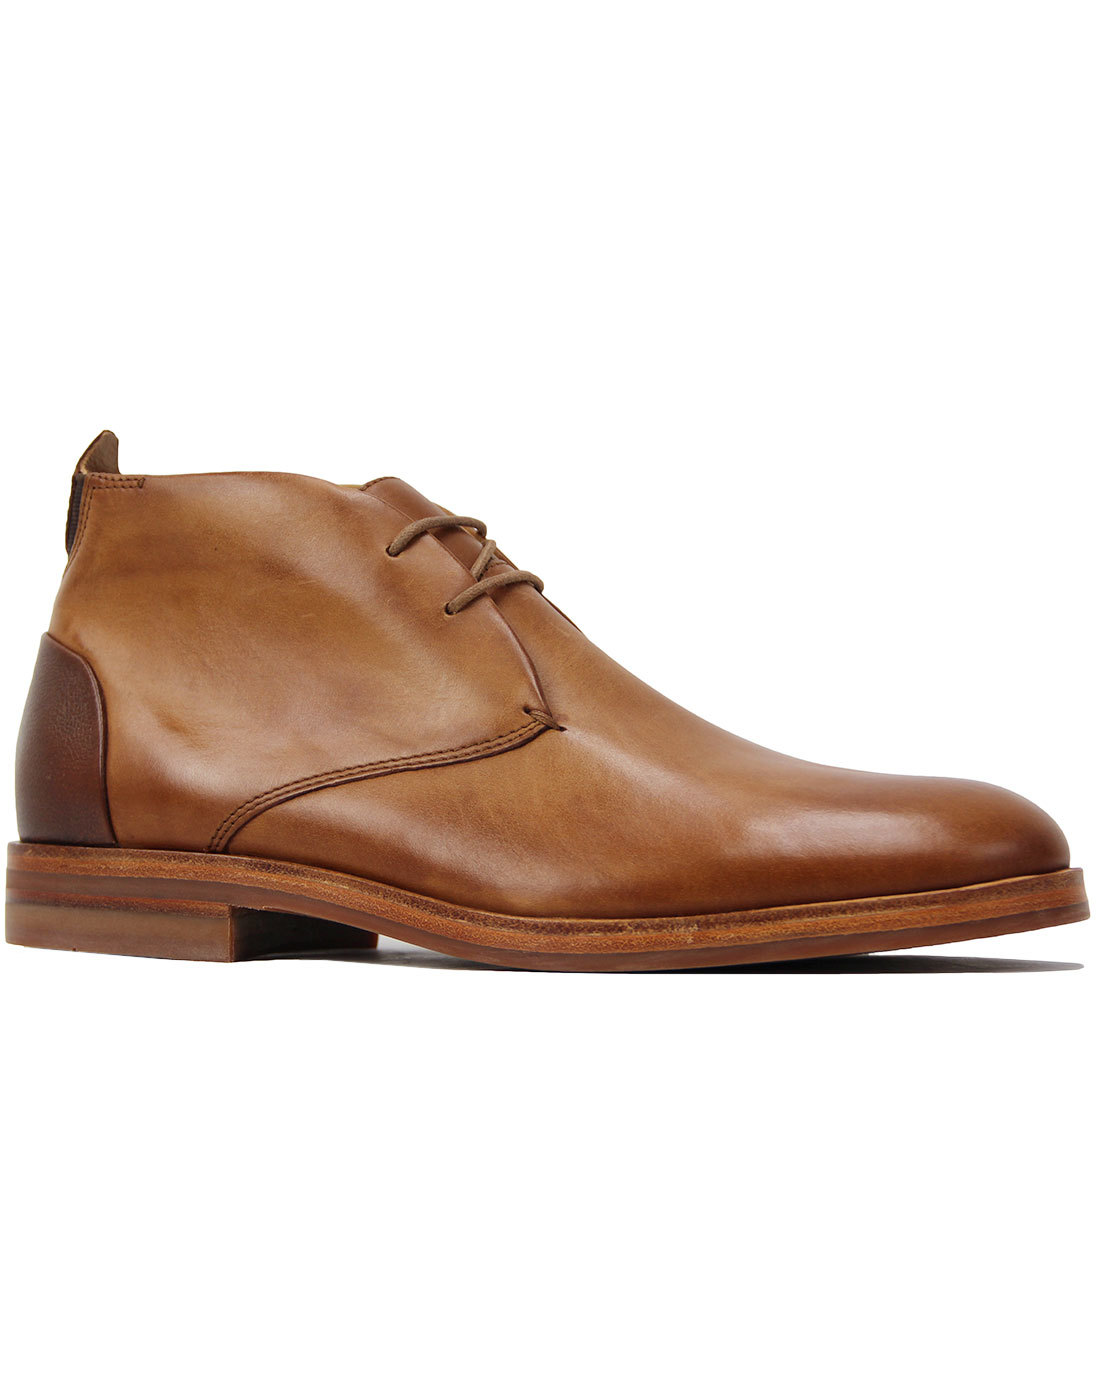 Matteo H by HUDSON 60s Mod Chukka Boots Tan